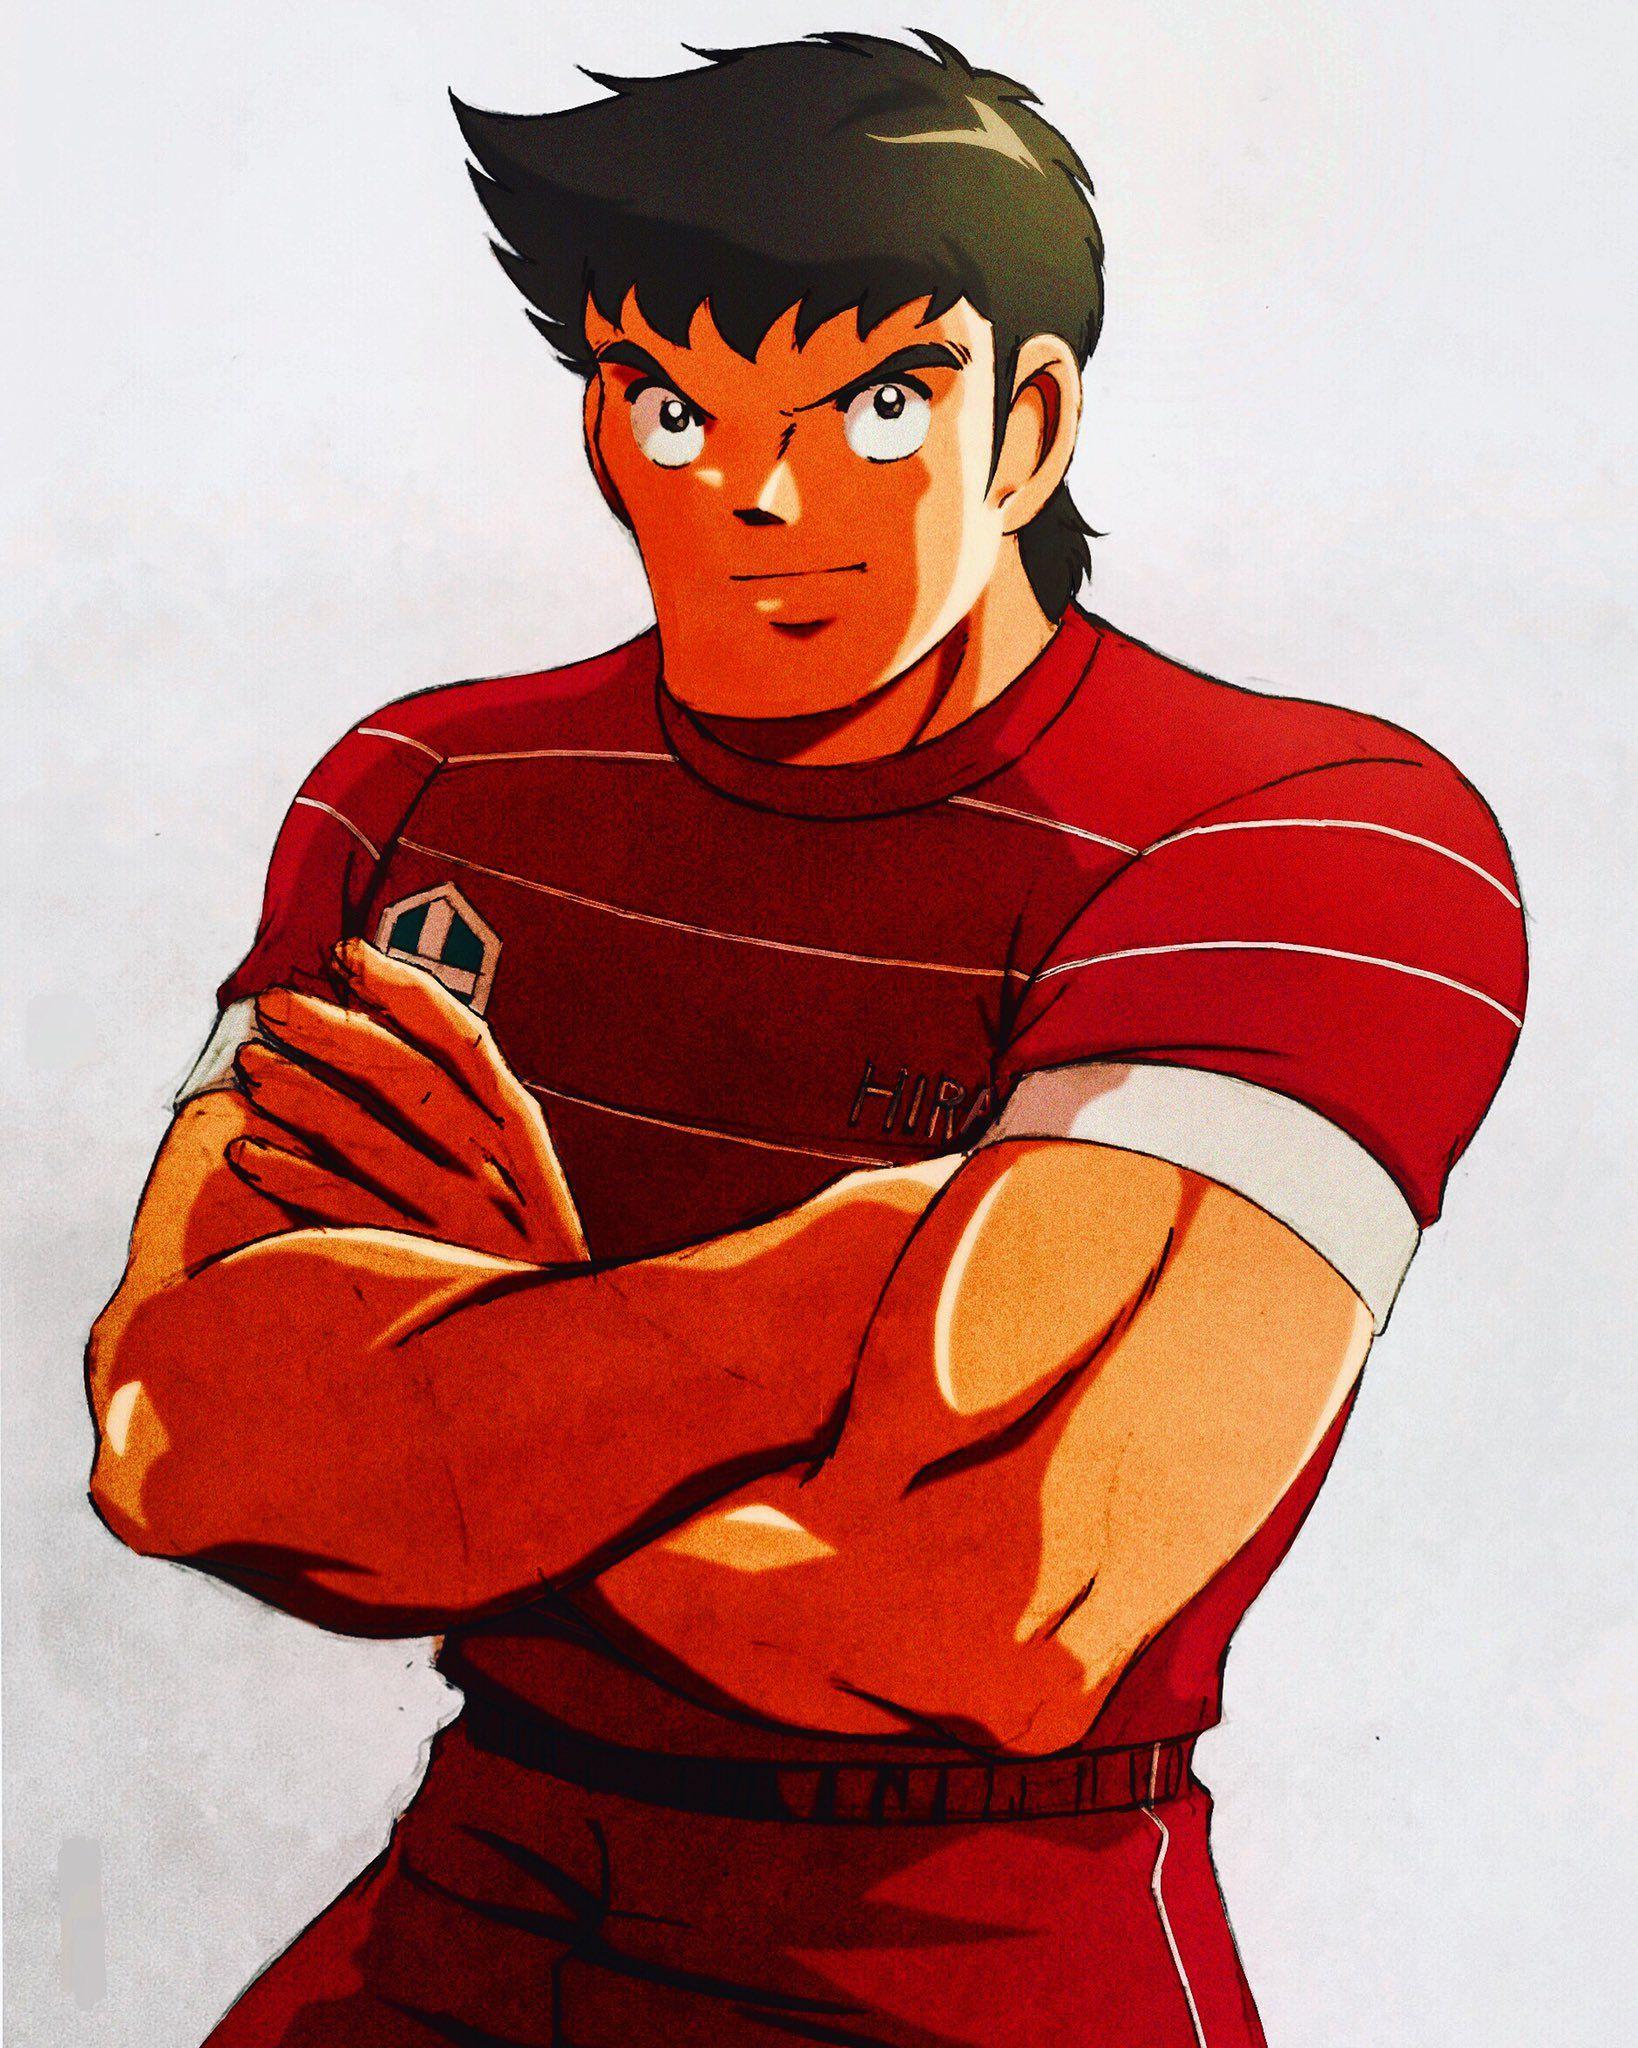 Captain Tsubasa 2018 Capitan tsubasa, Captain tsubasa